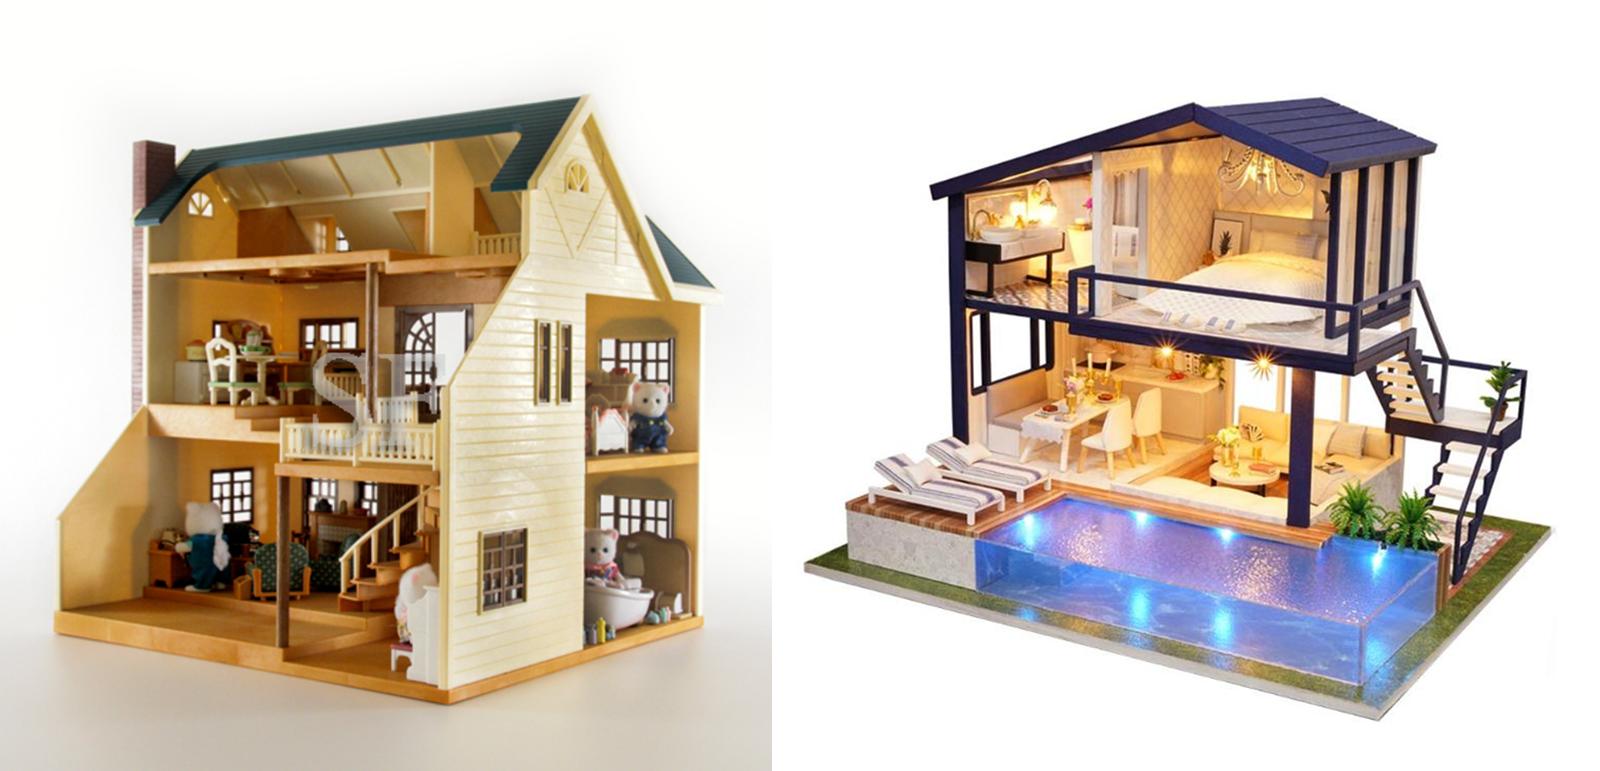 Слева — оригинал: двухэтажный домик с мансардой за 7000<span class=ruble>Р</span>. Справа — аналог: около 2000<span class=ruble>Р</span>